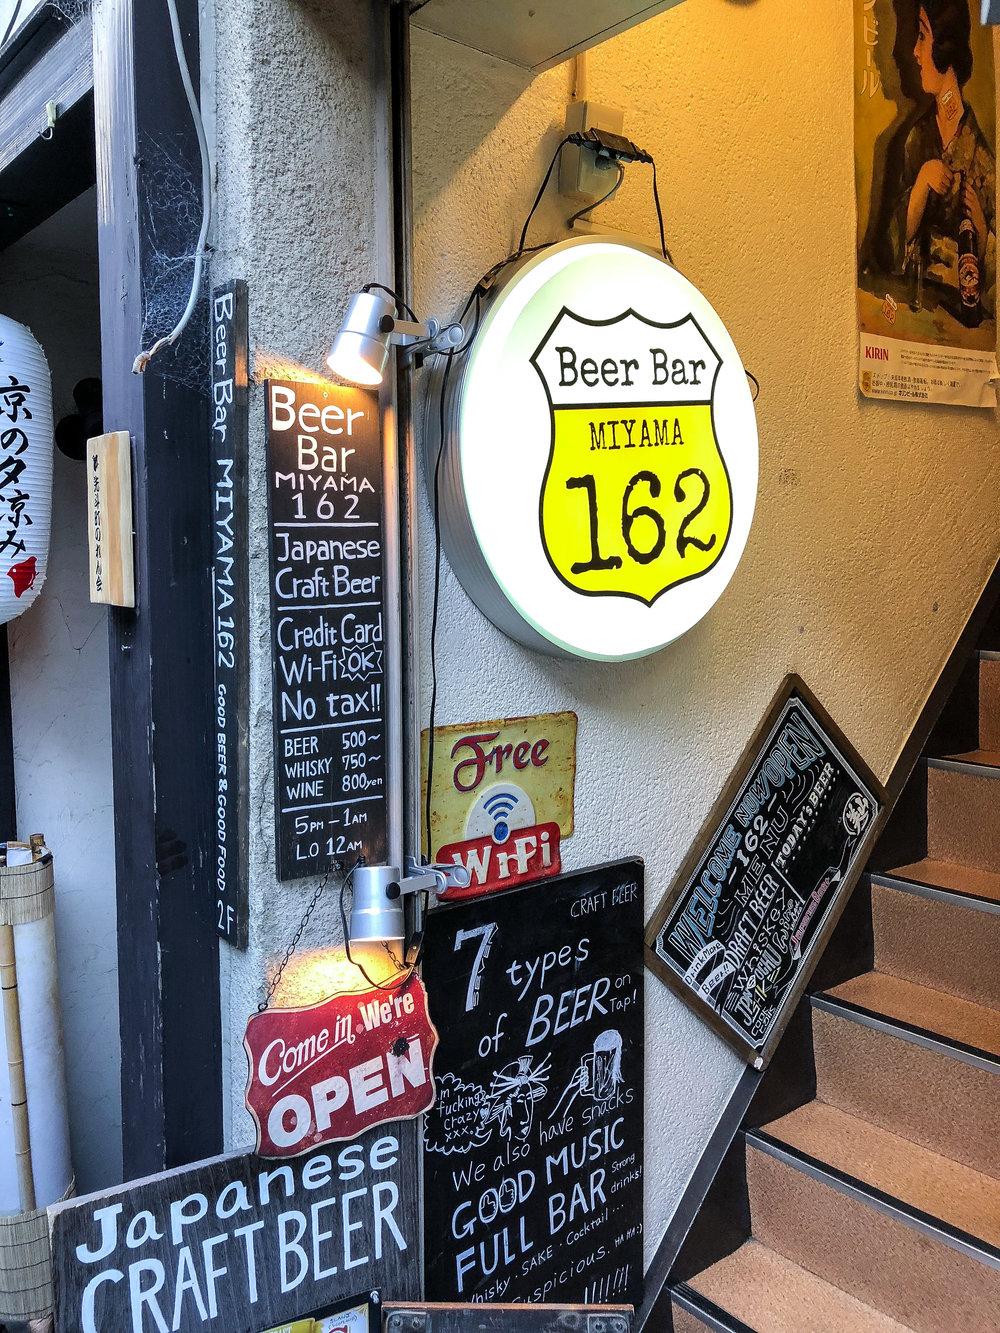 BeerBar MIYAMA 162, Kyoto  Photo © Øhm Sweet Øhm